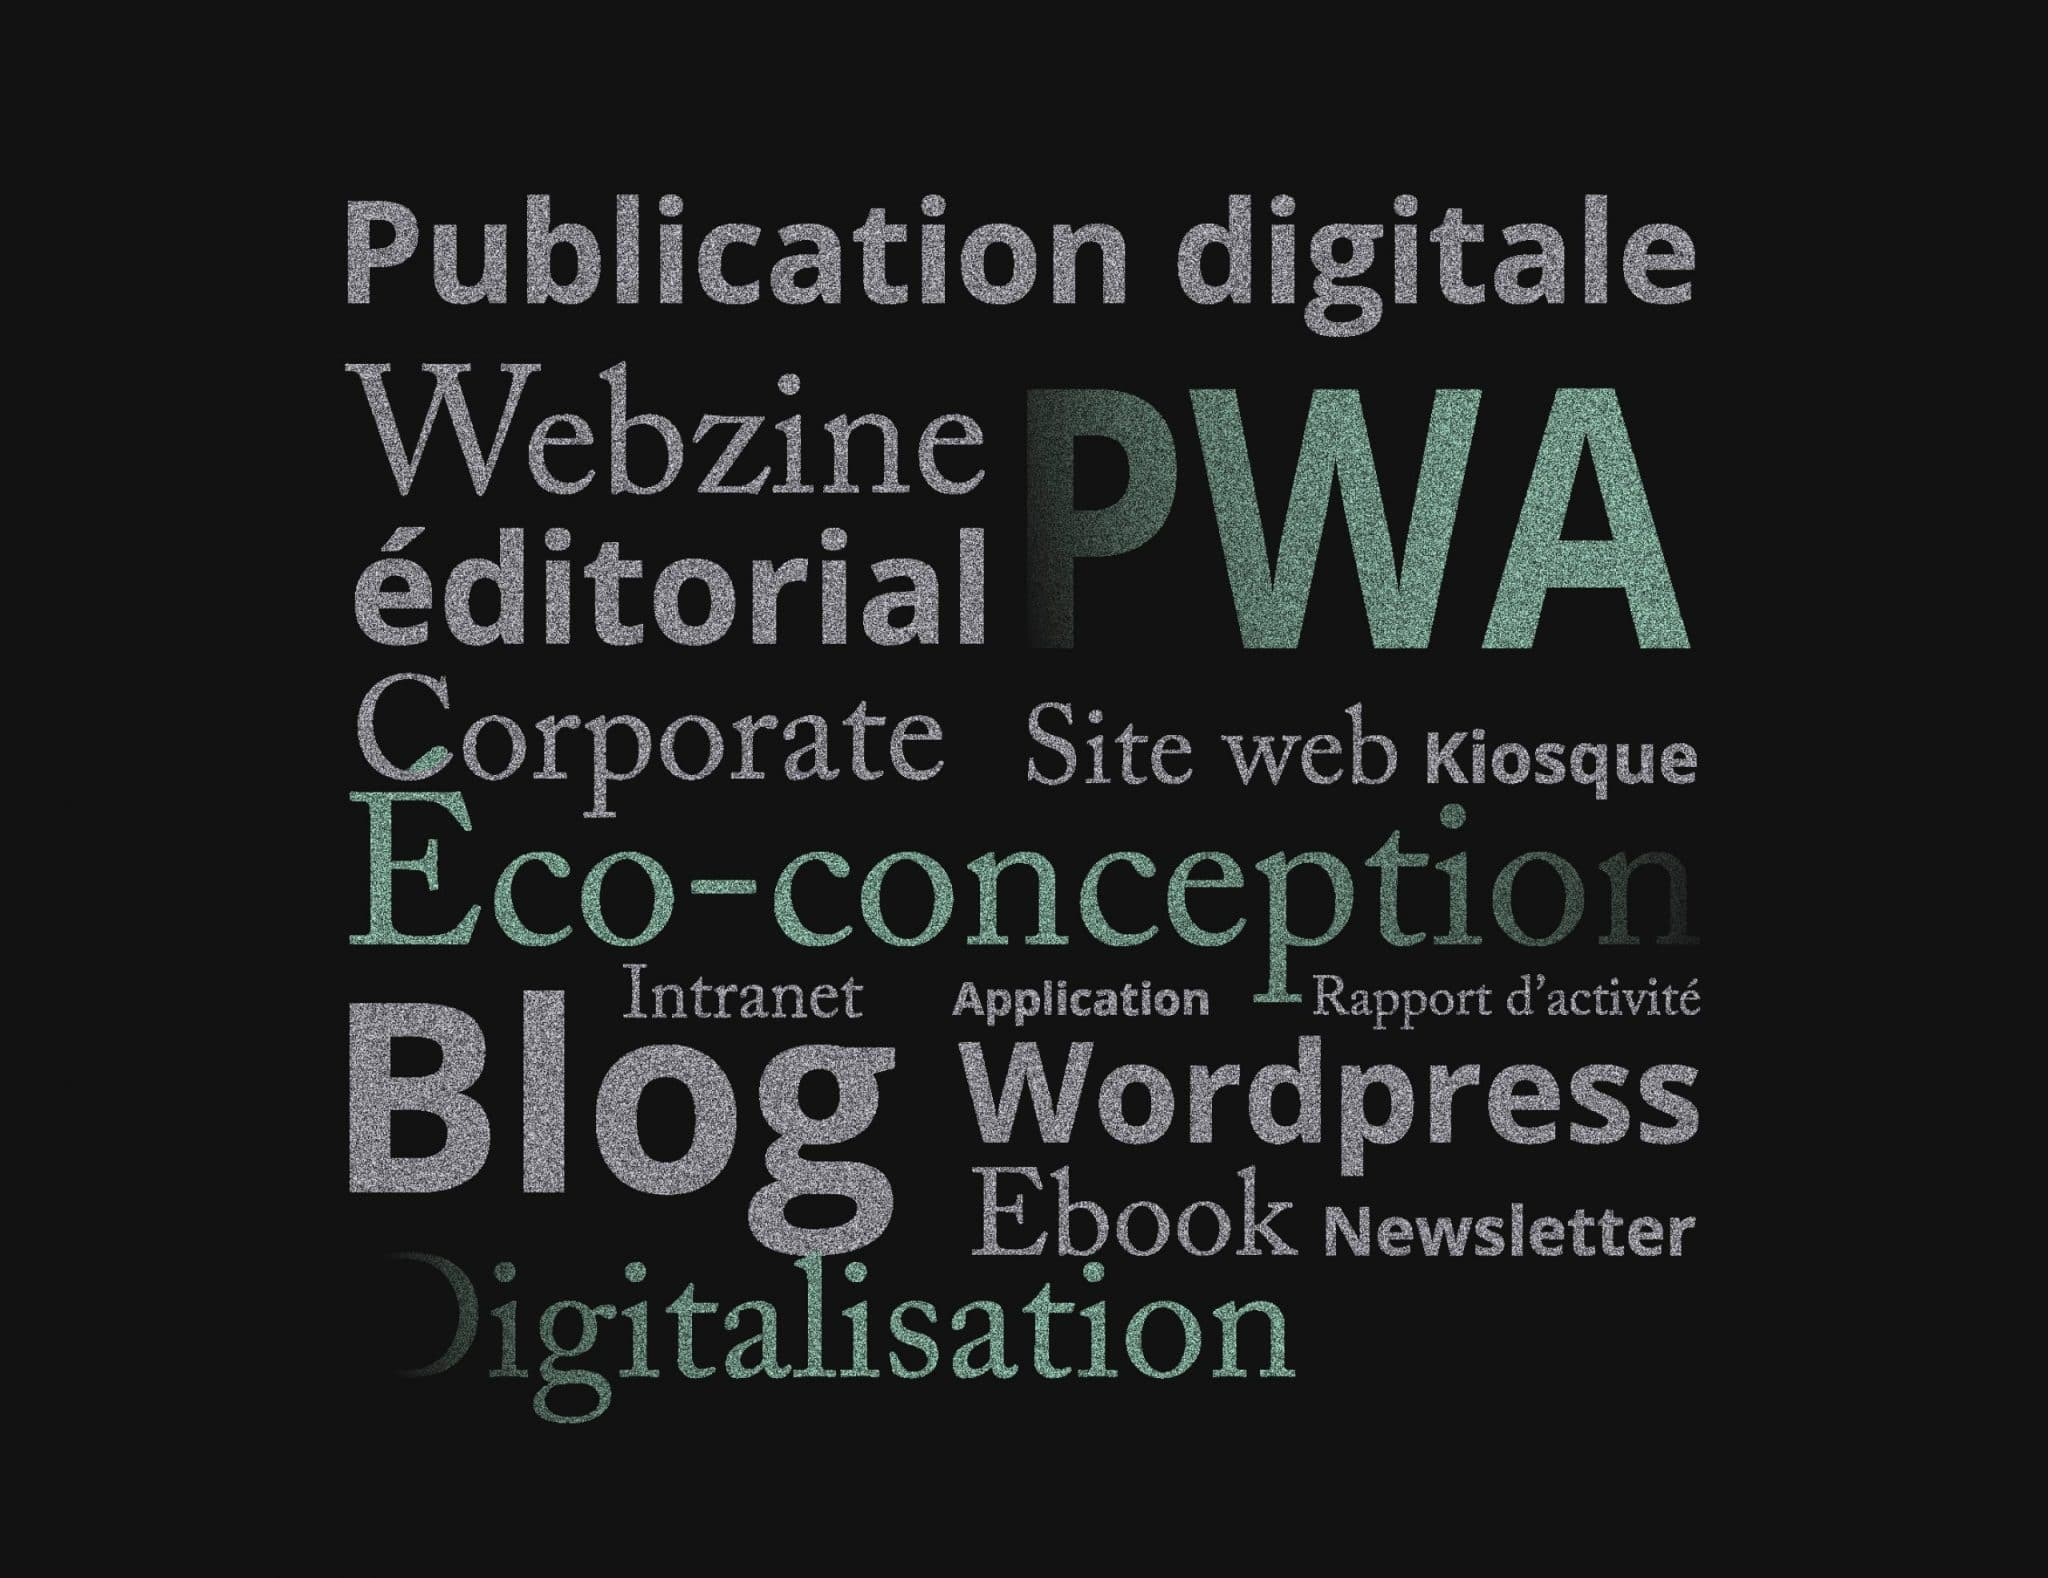 Publication digitale, Webzine, PWA, éditorial, Eco-conception, Application, Extranet, Intranet, Rapport d'activité, WordPress, Blog, Ebook, digitalisation